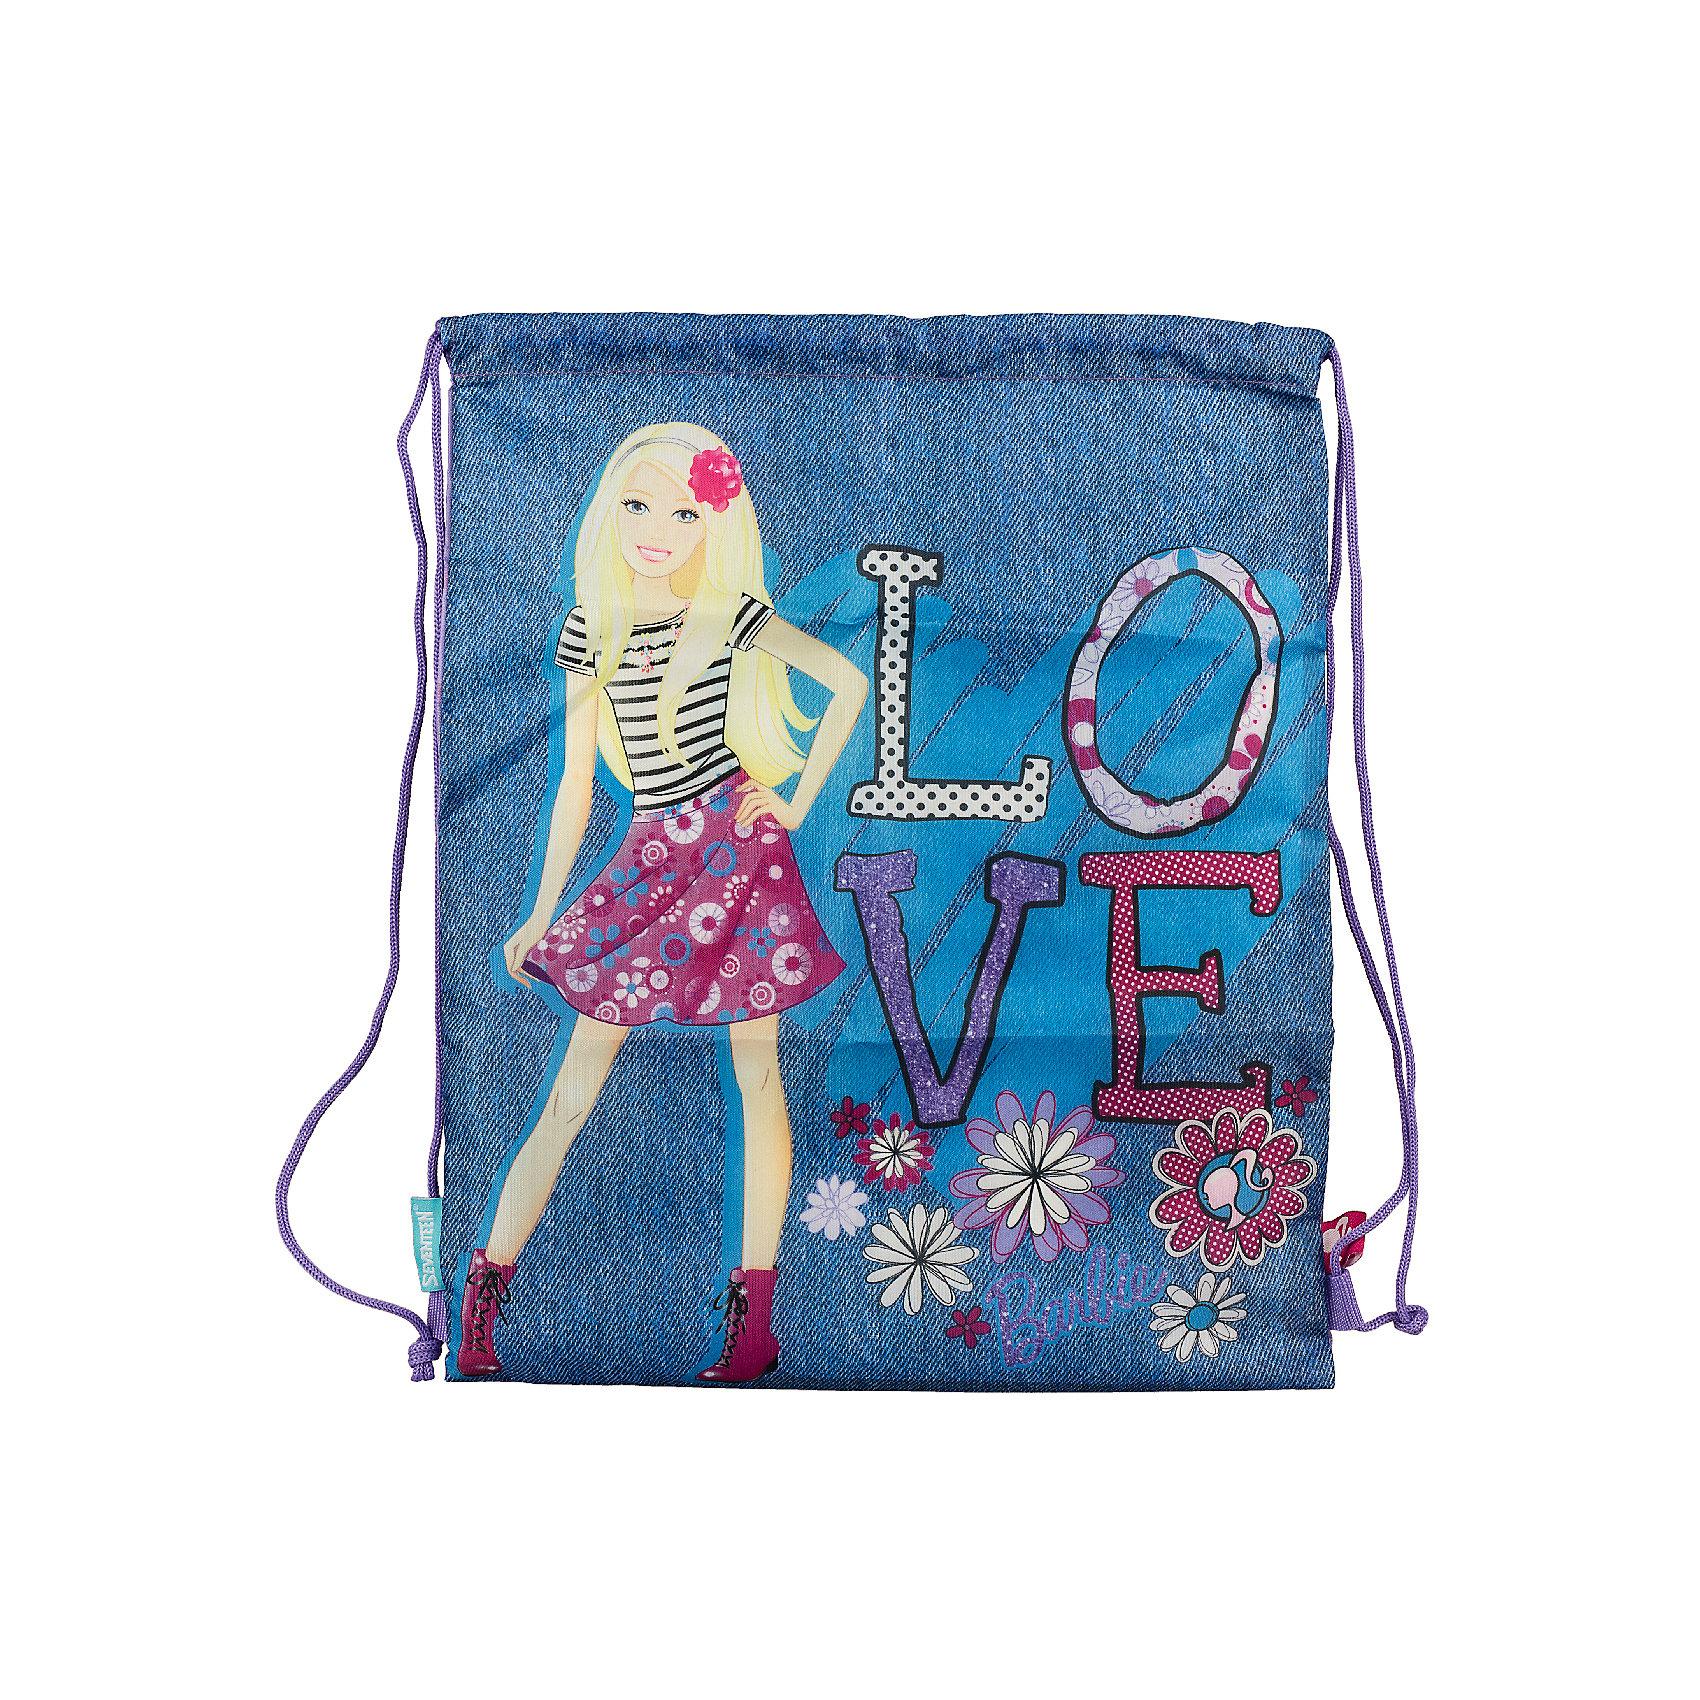 Академия групп Сумка-рюкзак для обуви, Barbie мешок для обуви академия групп transformers 43 34см trbb ut1 883